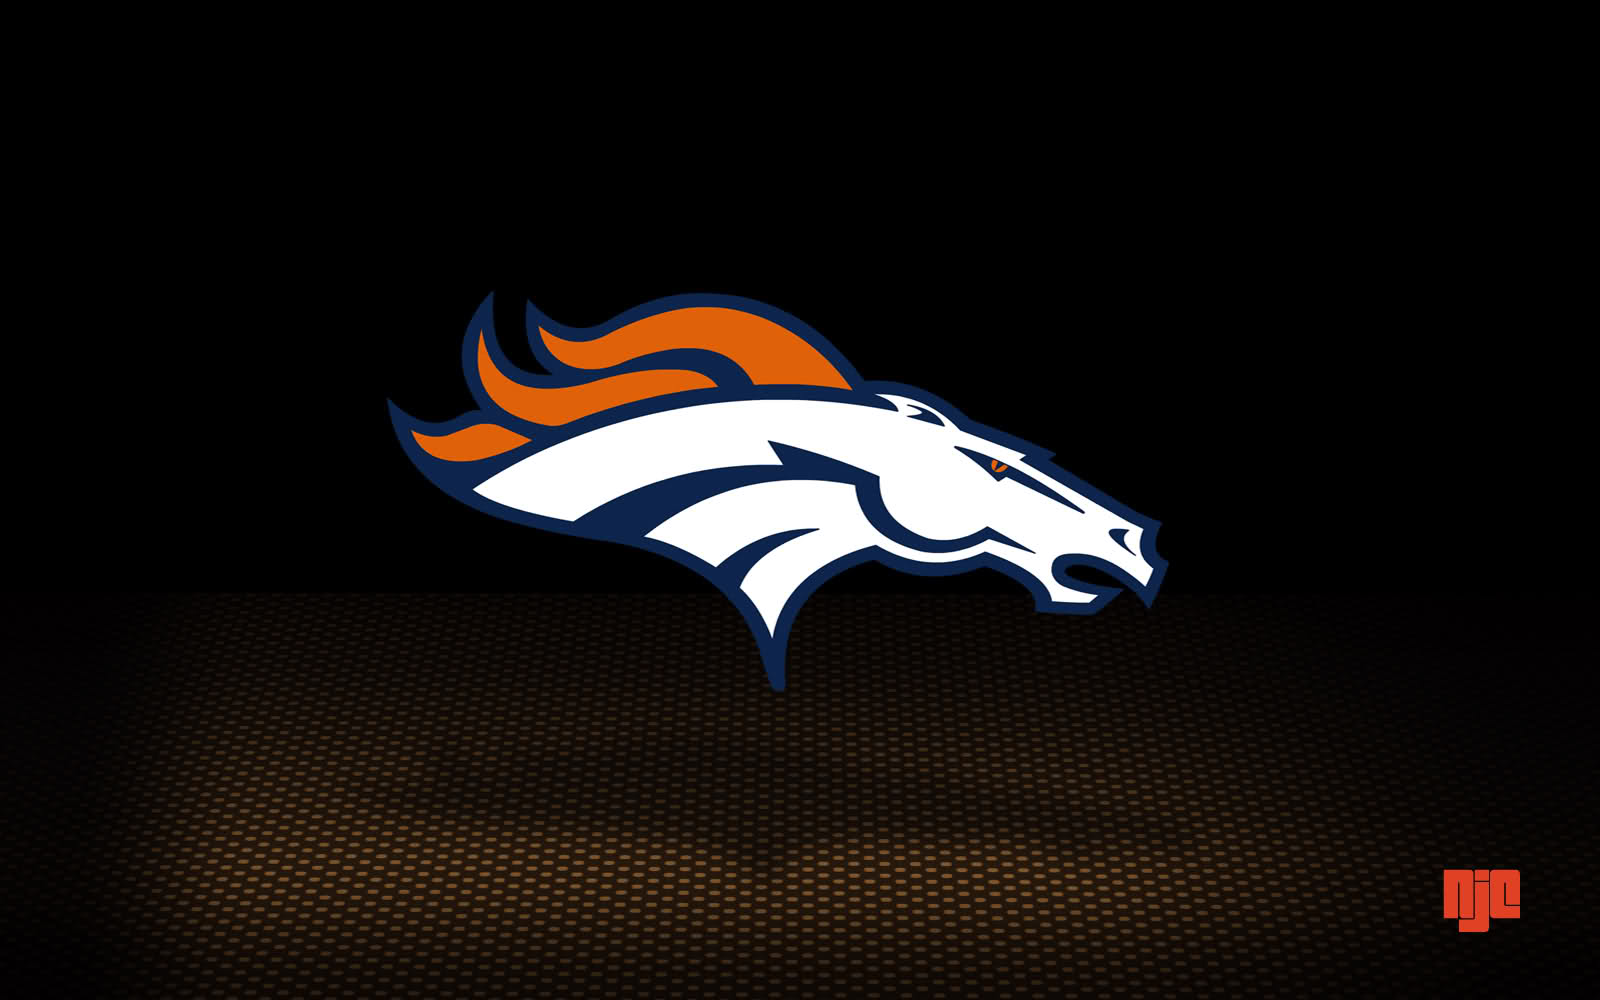 Broncos Iphone Wallpaper Denver broncos wallpaper 1600x1000